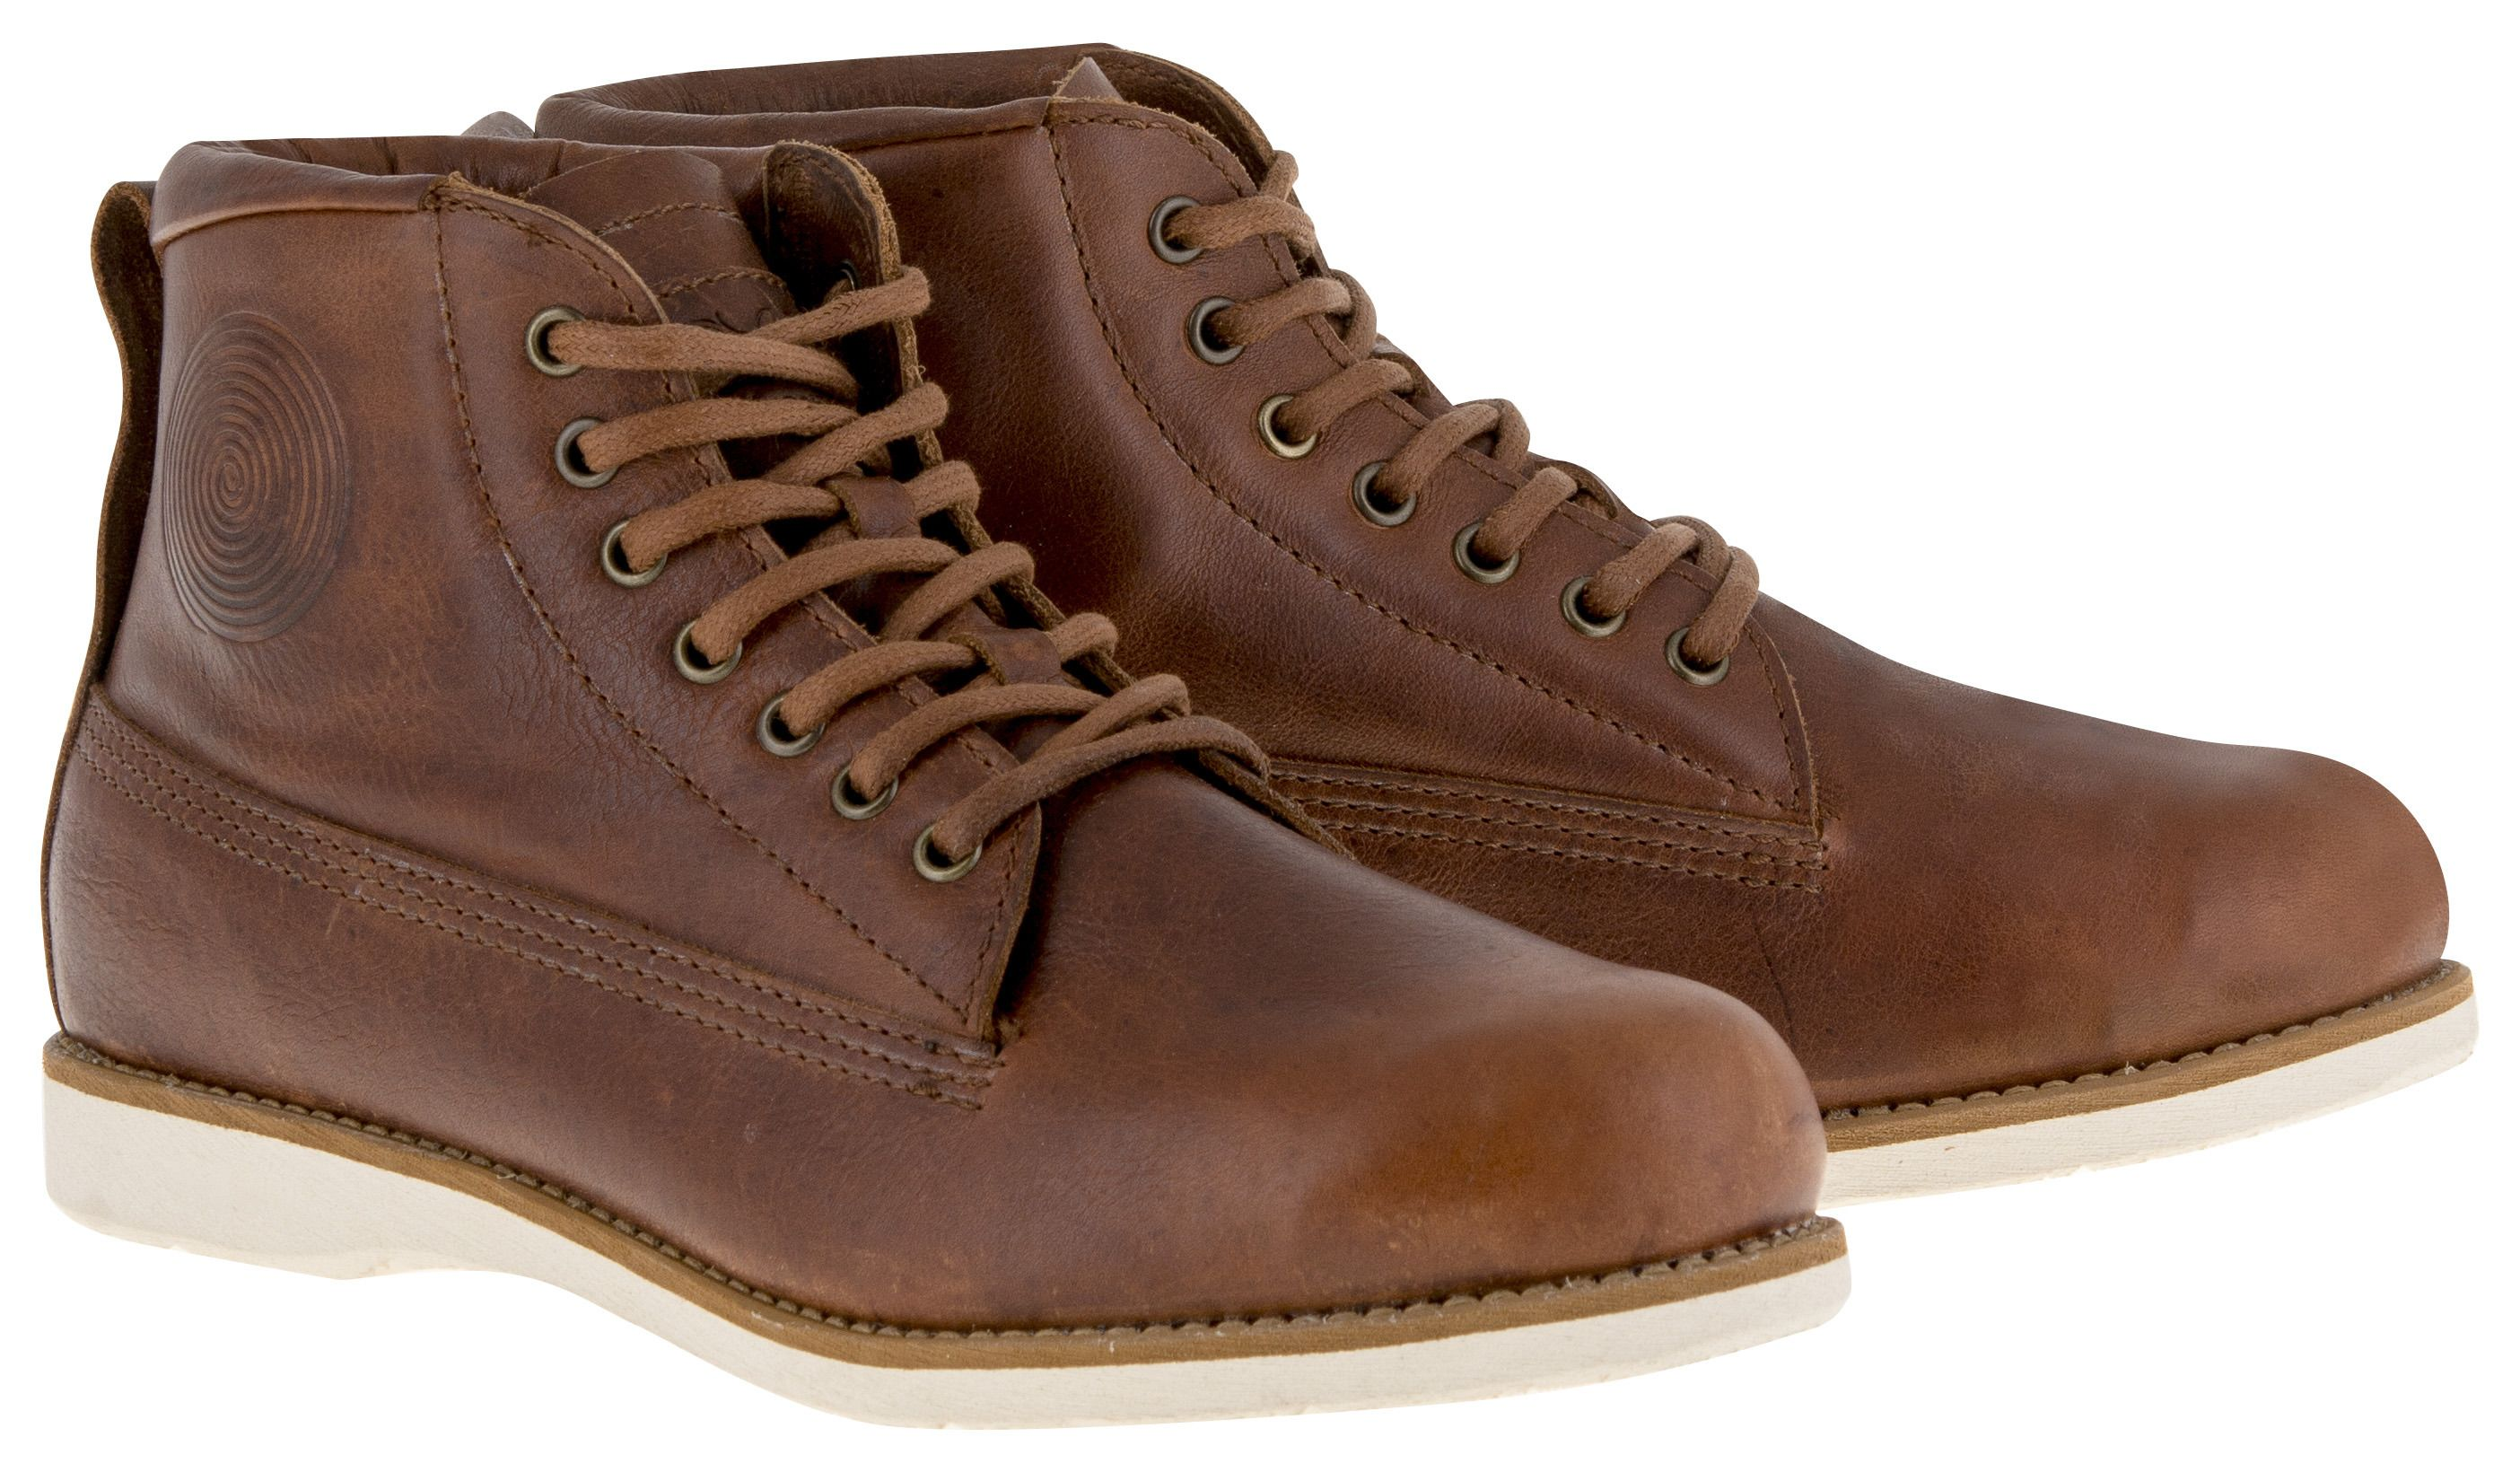 Alpinestars Oscar Rayburn Boots Revzilla